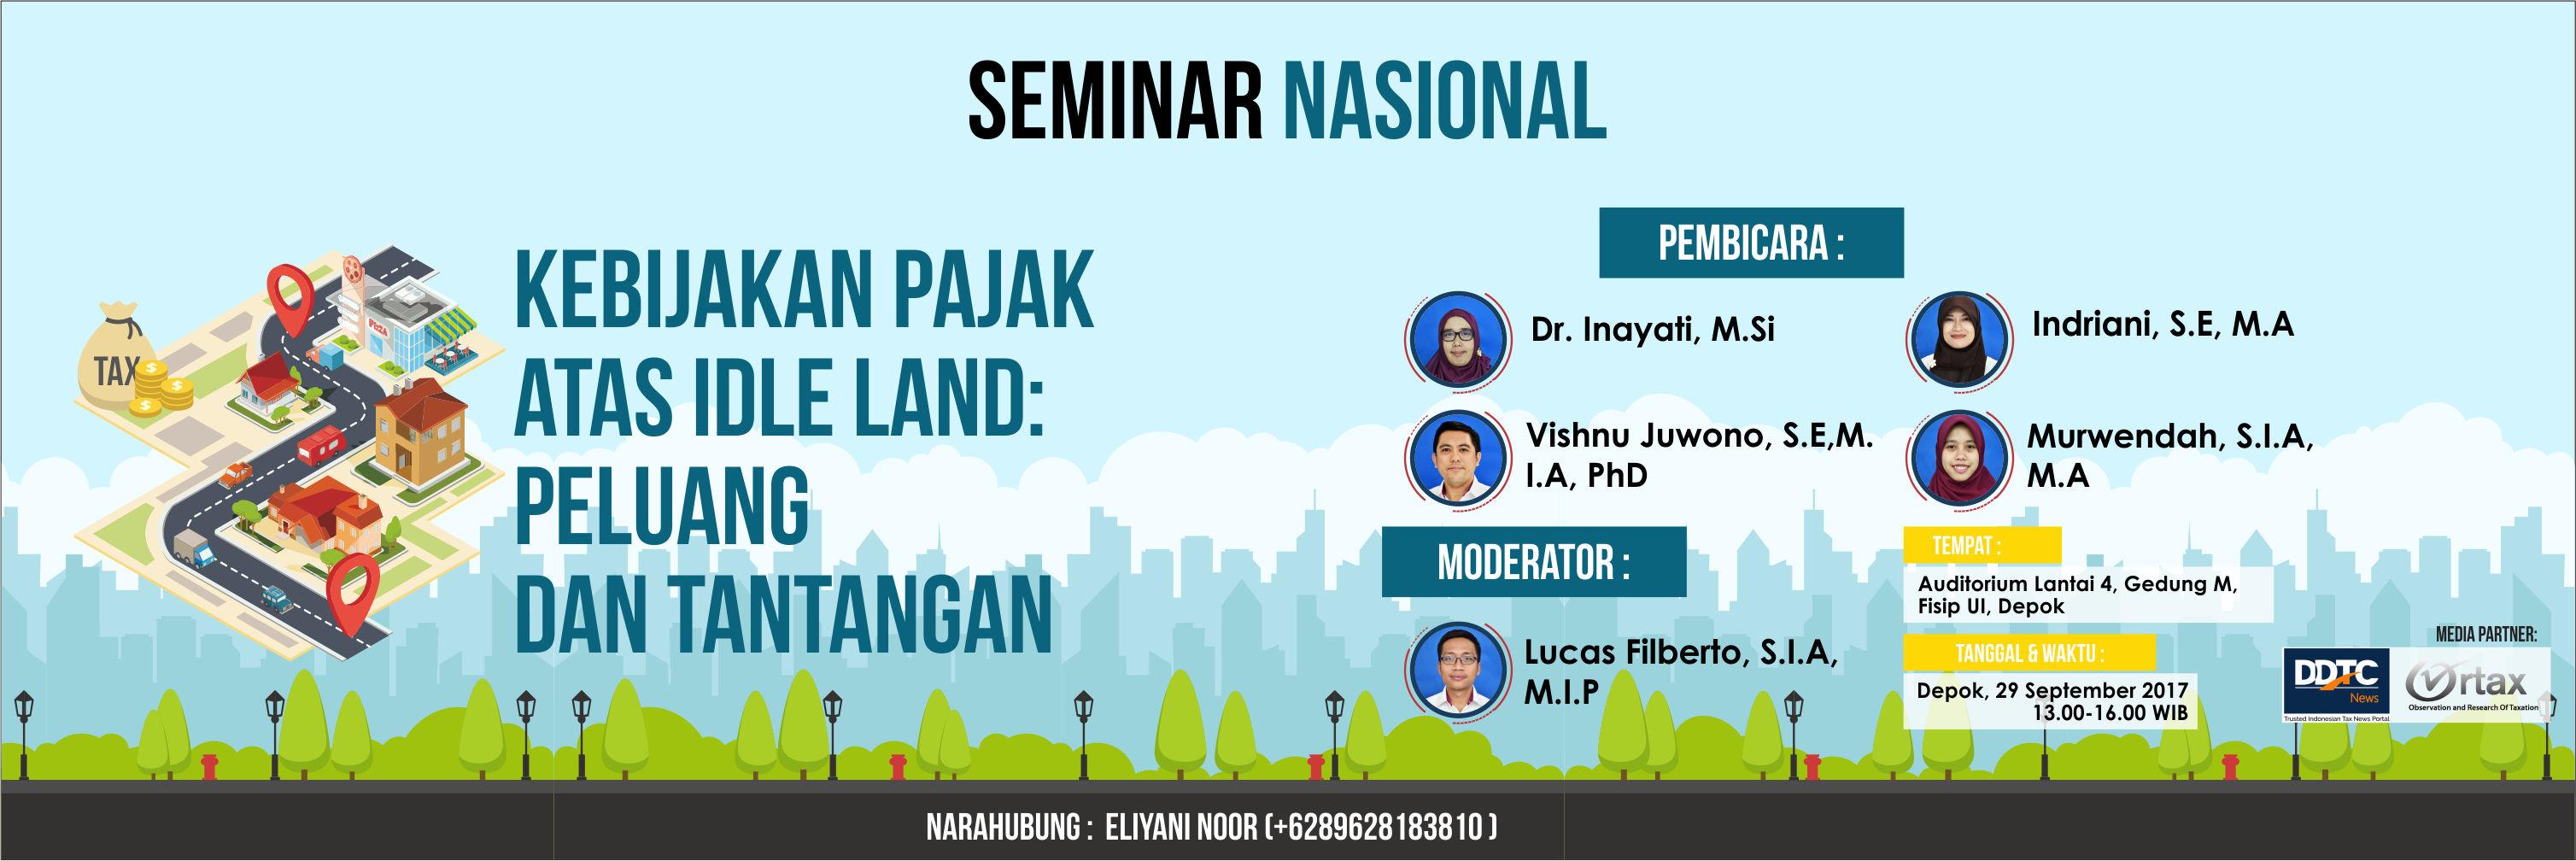 seminar-poltax